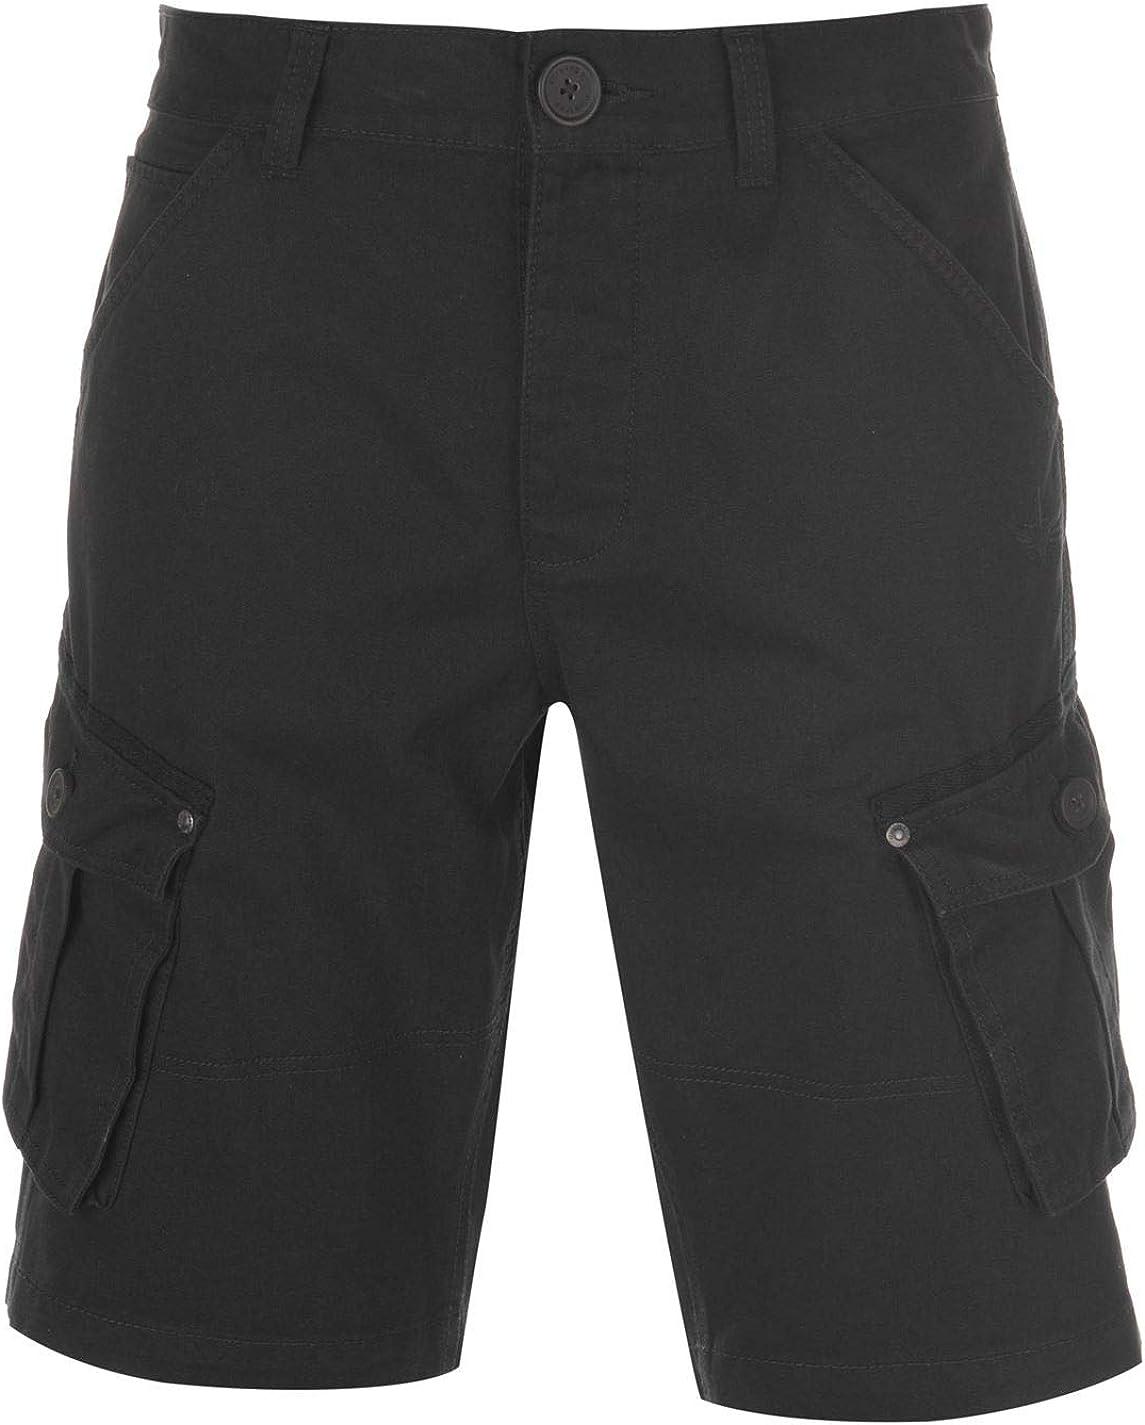 Firetrap Mens BTK Shorts Cargo Pants Trousers Bottoms